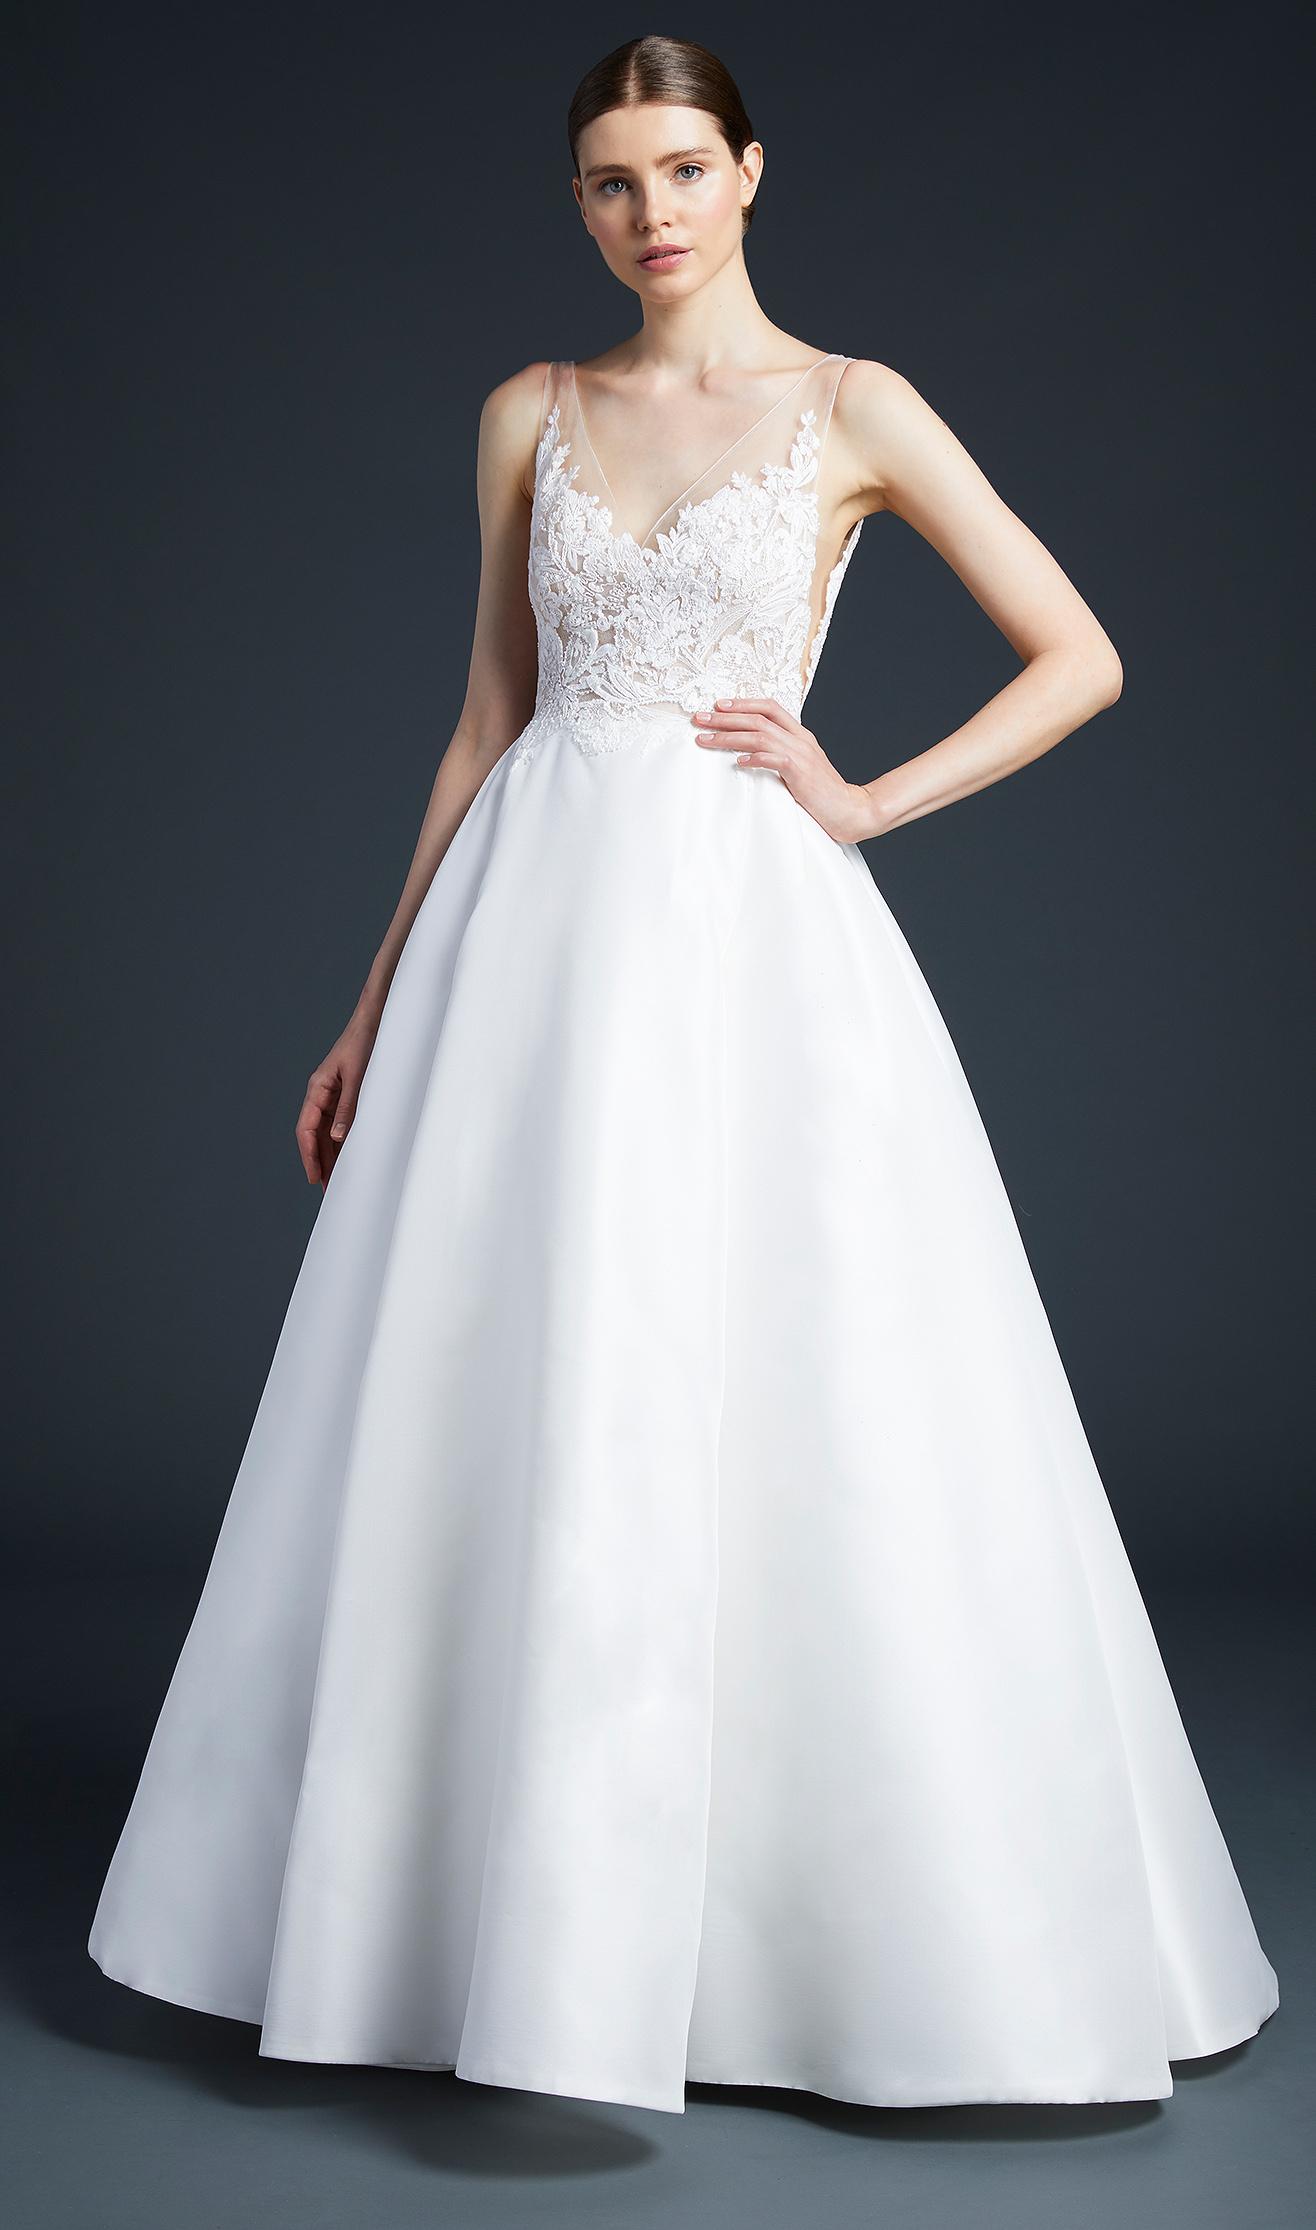 anne barge sweetheart ball gown wedding dress fall 2019